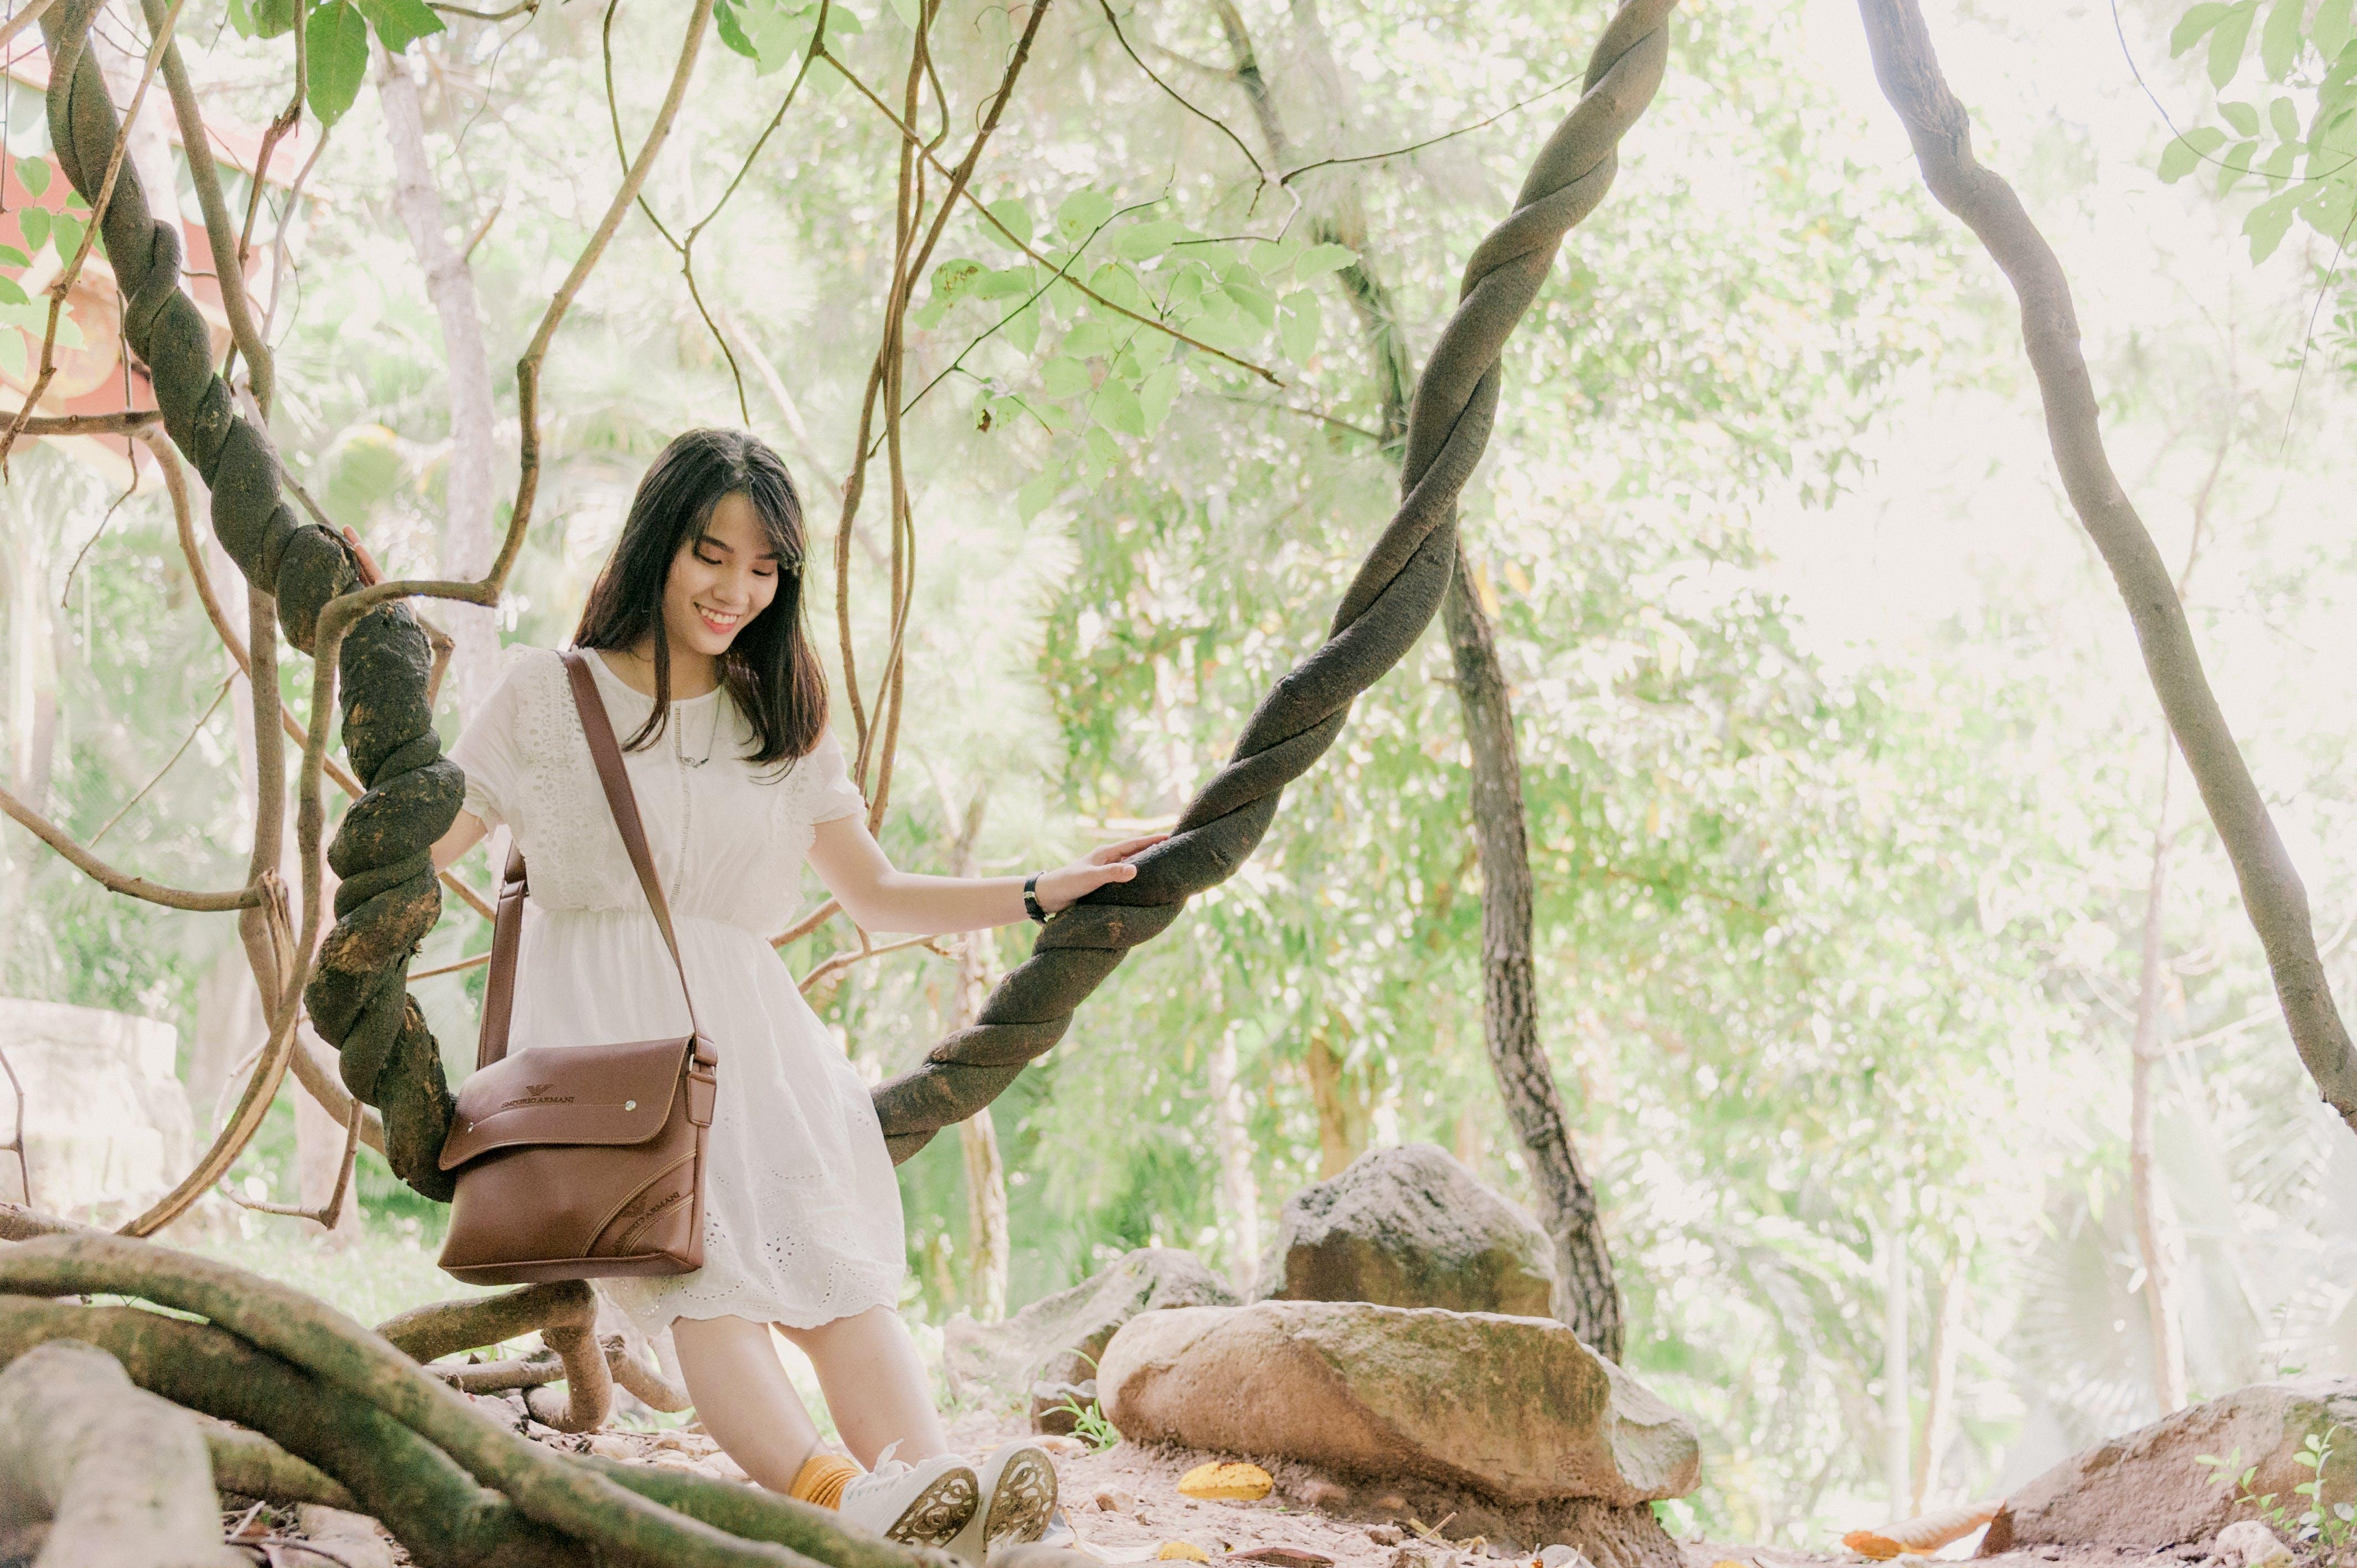 Woman Standing Near Trees